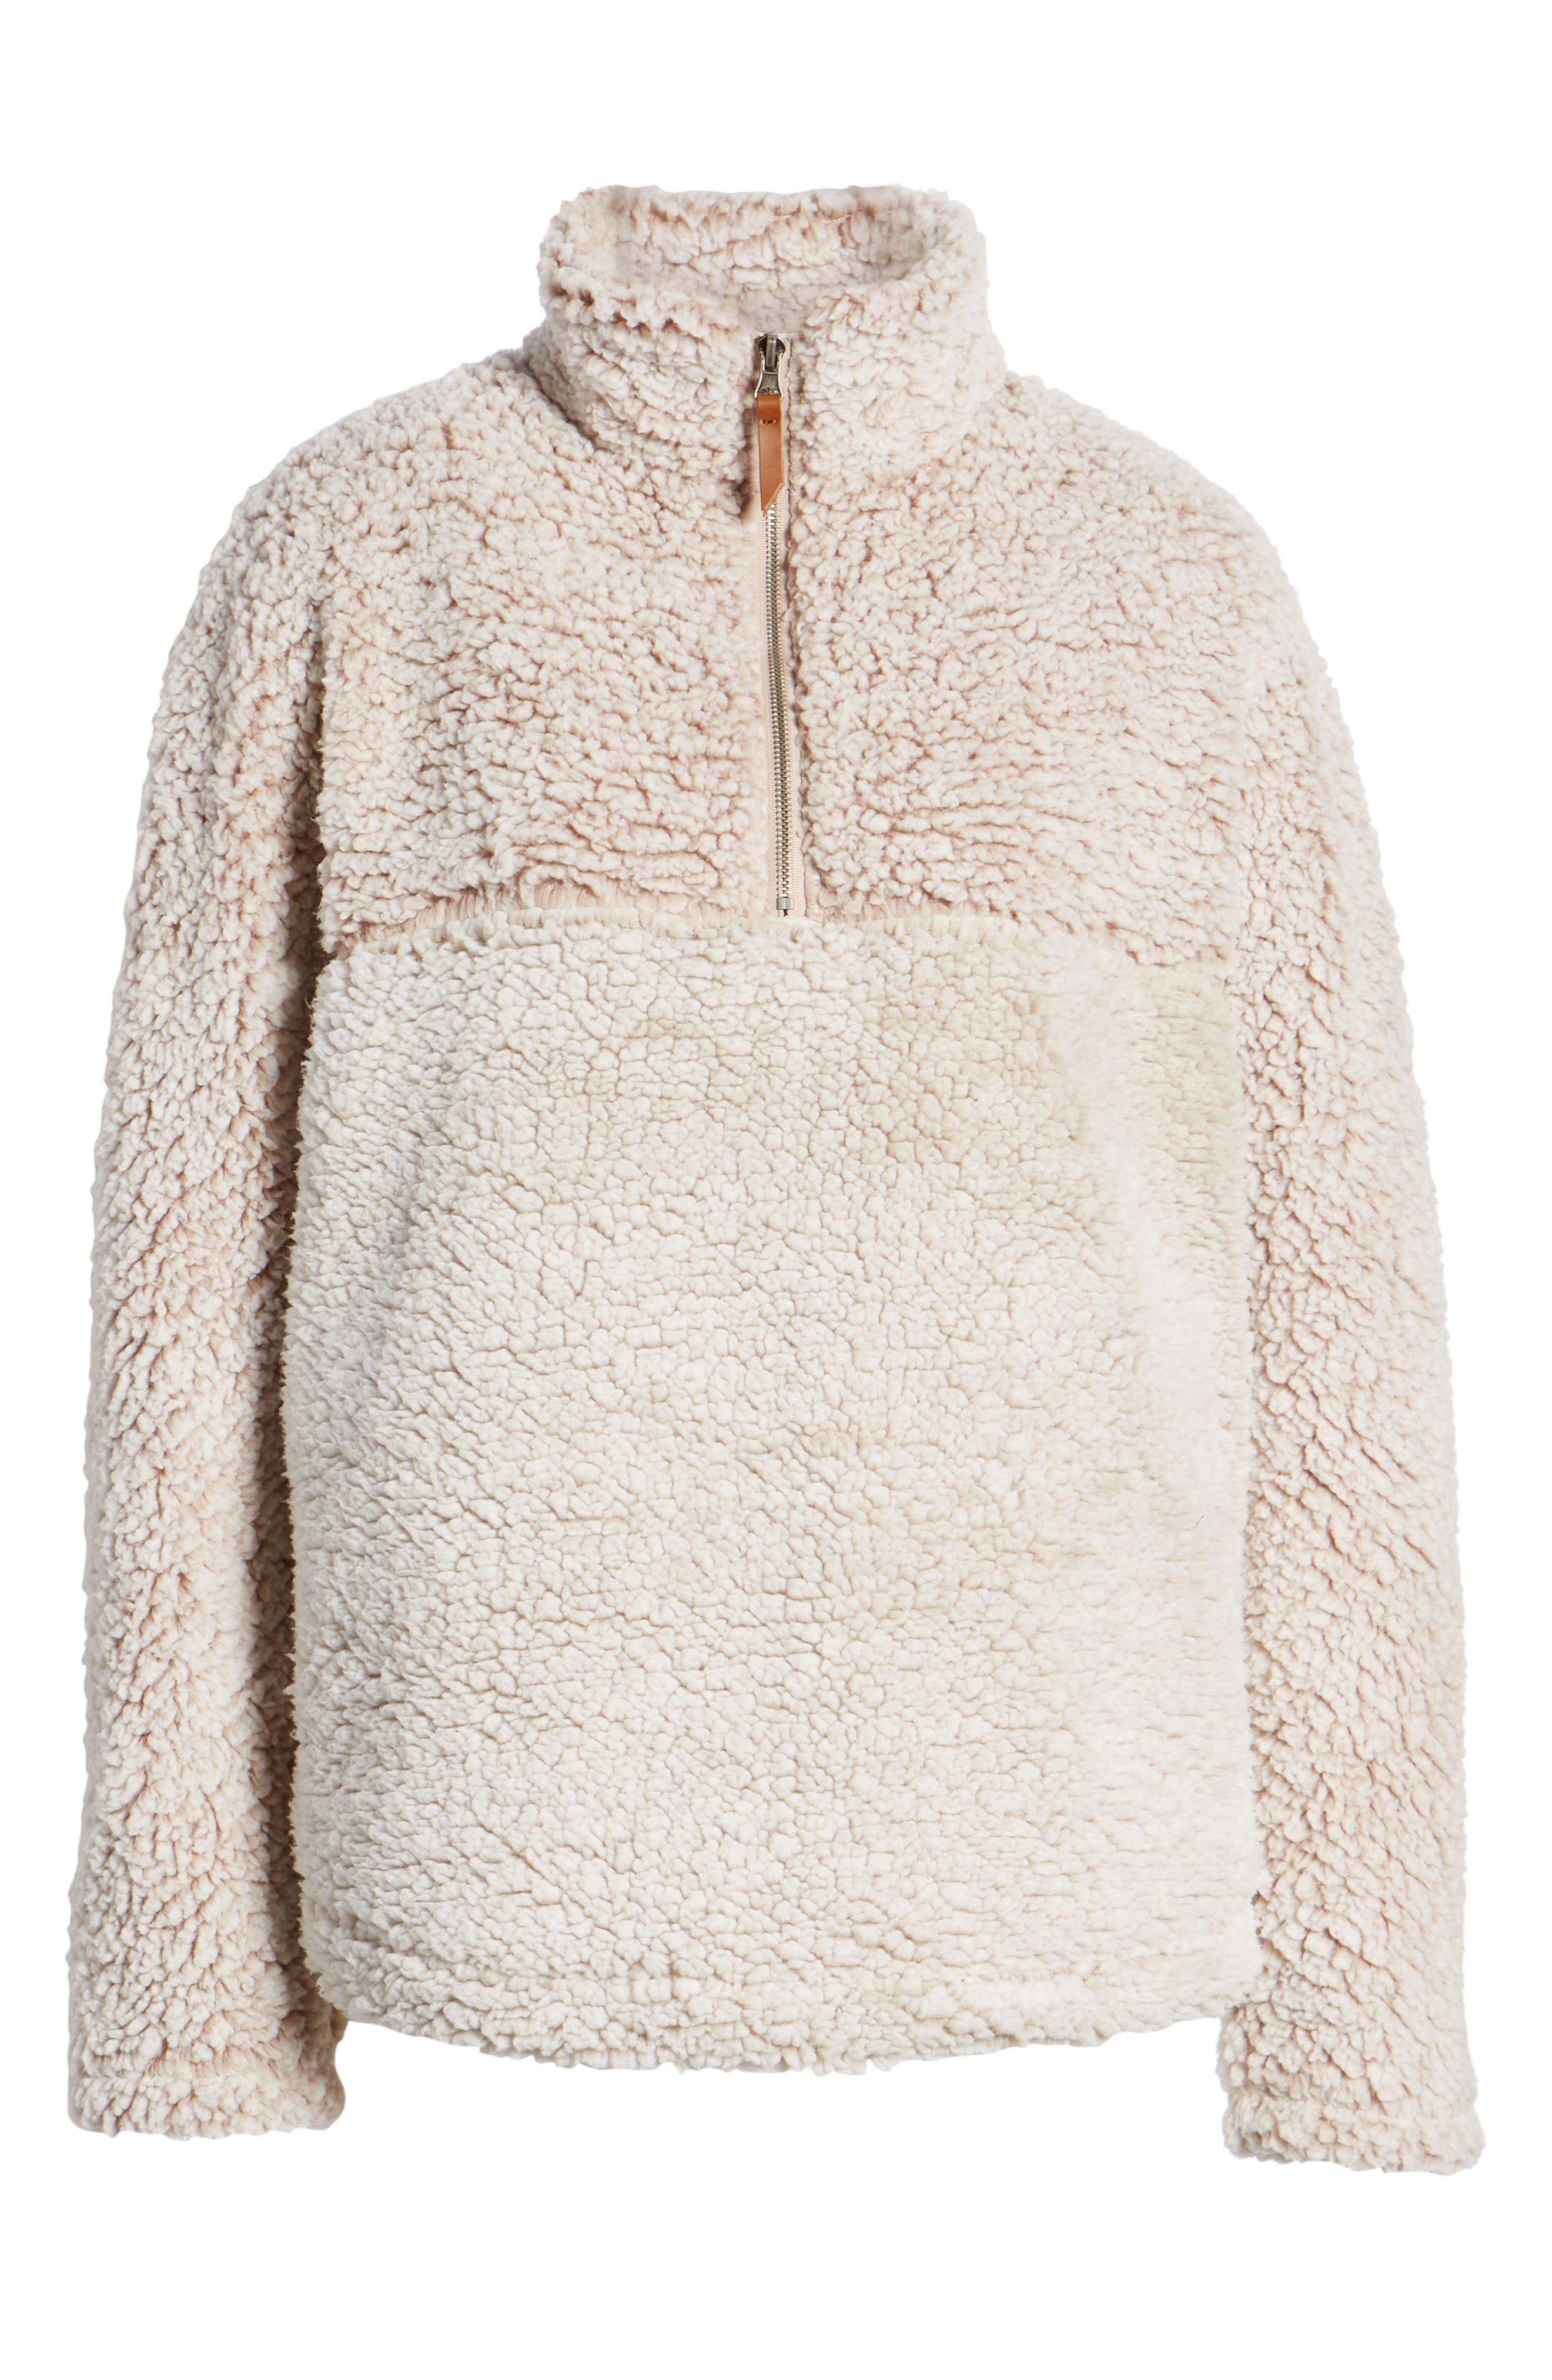 THREAD & SUPPLY, Colorblock Wubby Fleece Pullover, Alternate thumbnail 6, color, SMOKE ROSE IVORY